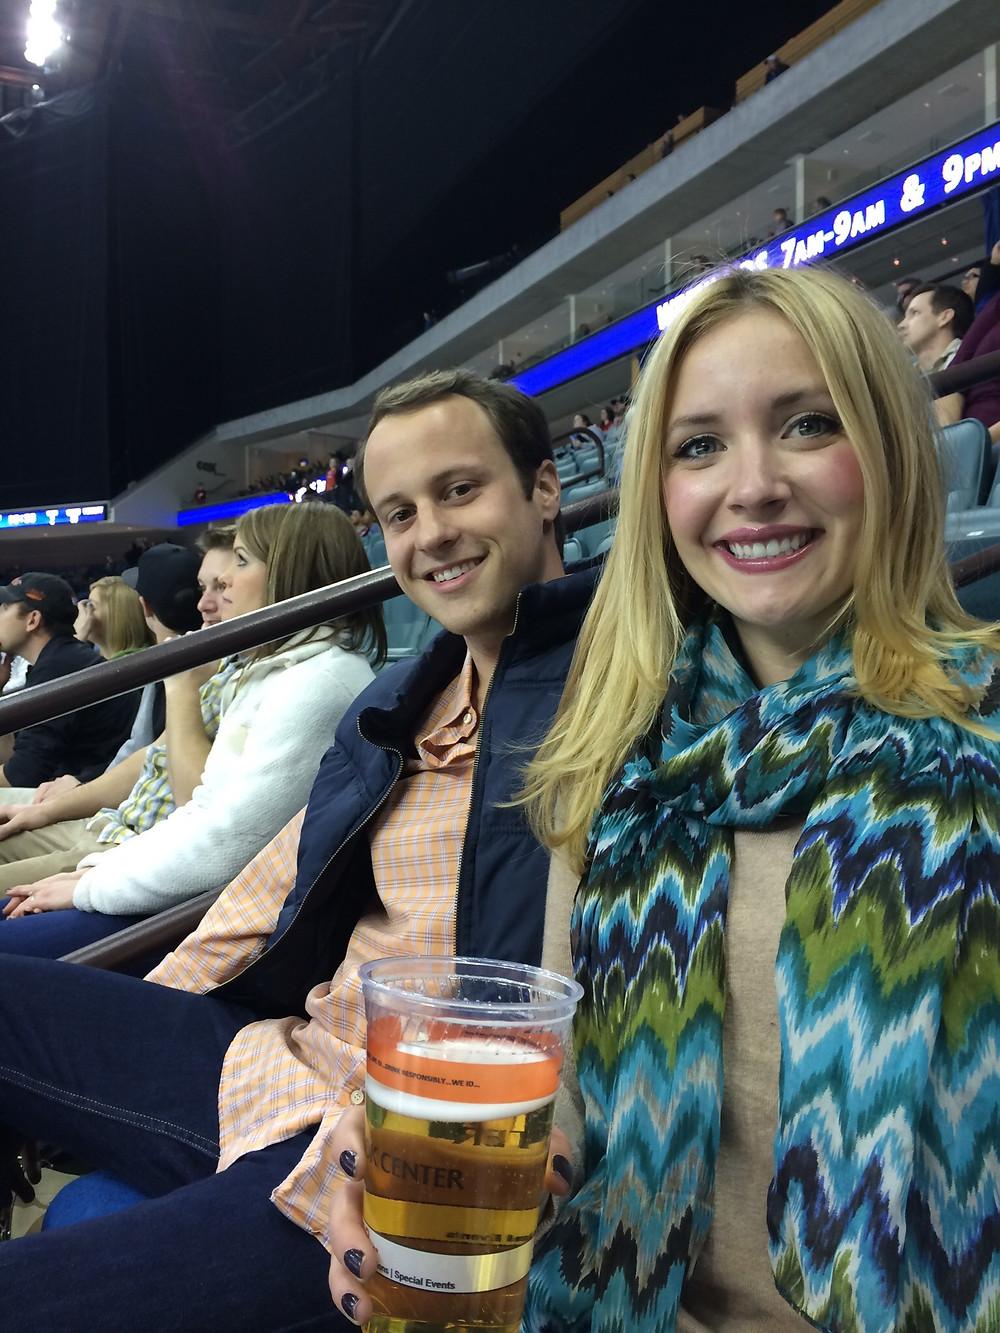 Tulsa Oilers Hockey Game